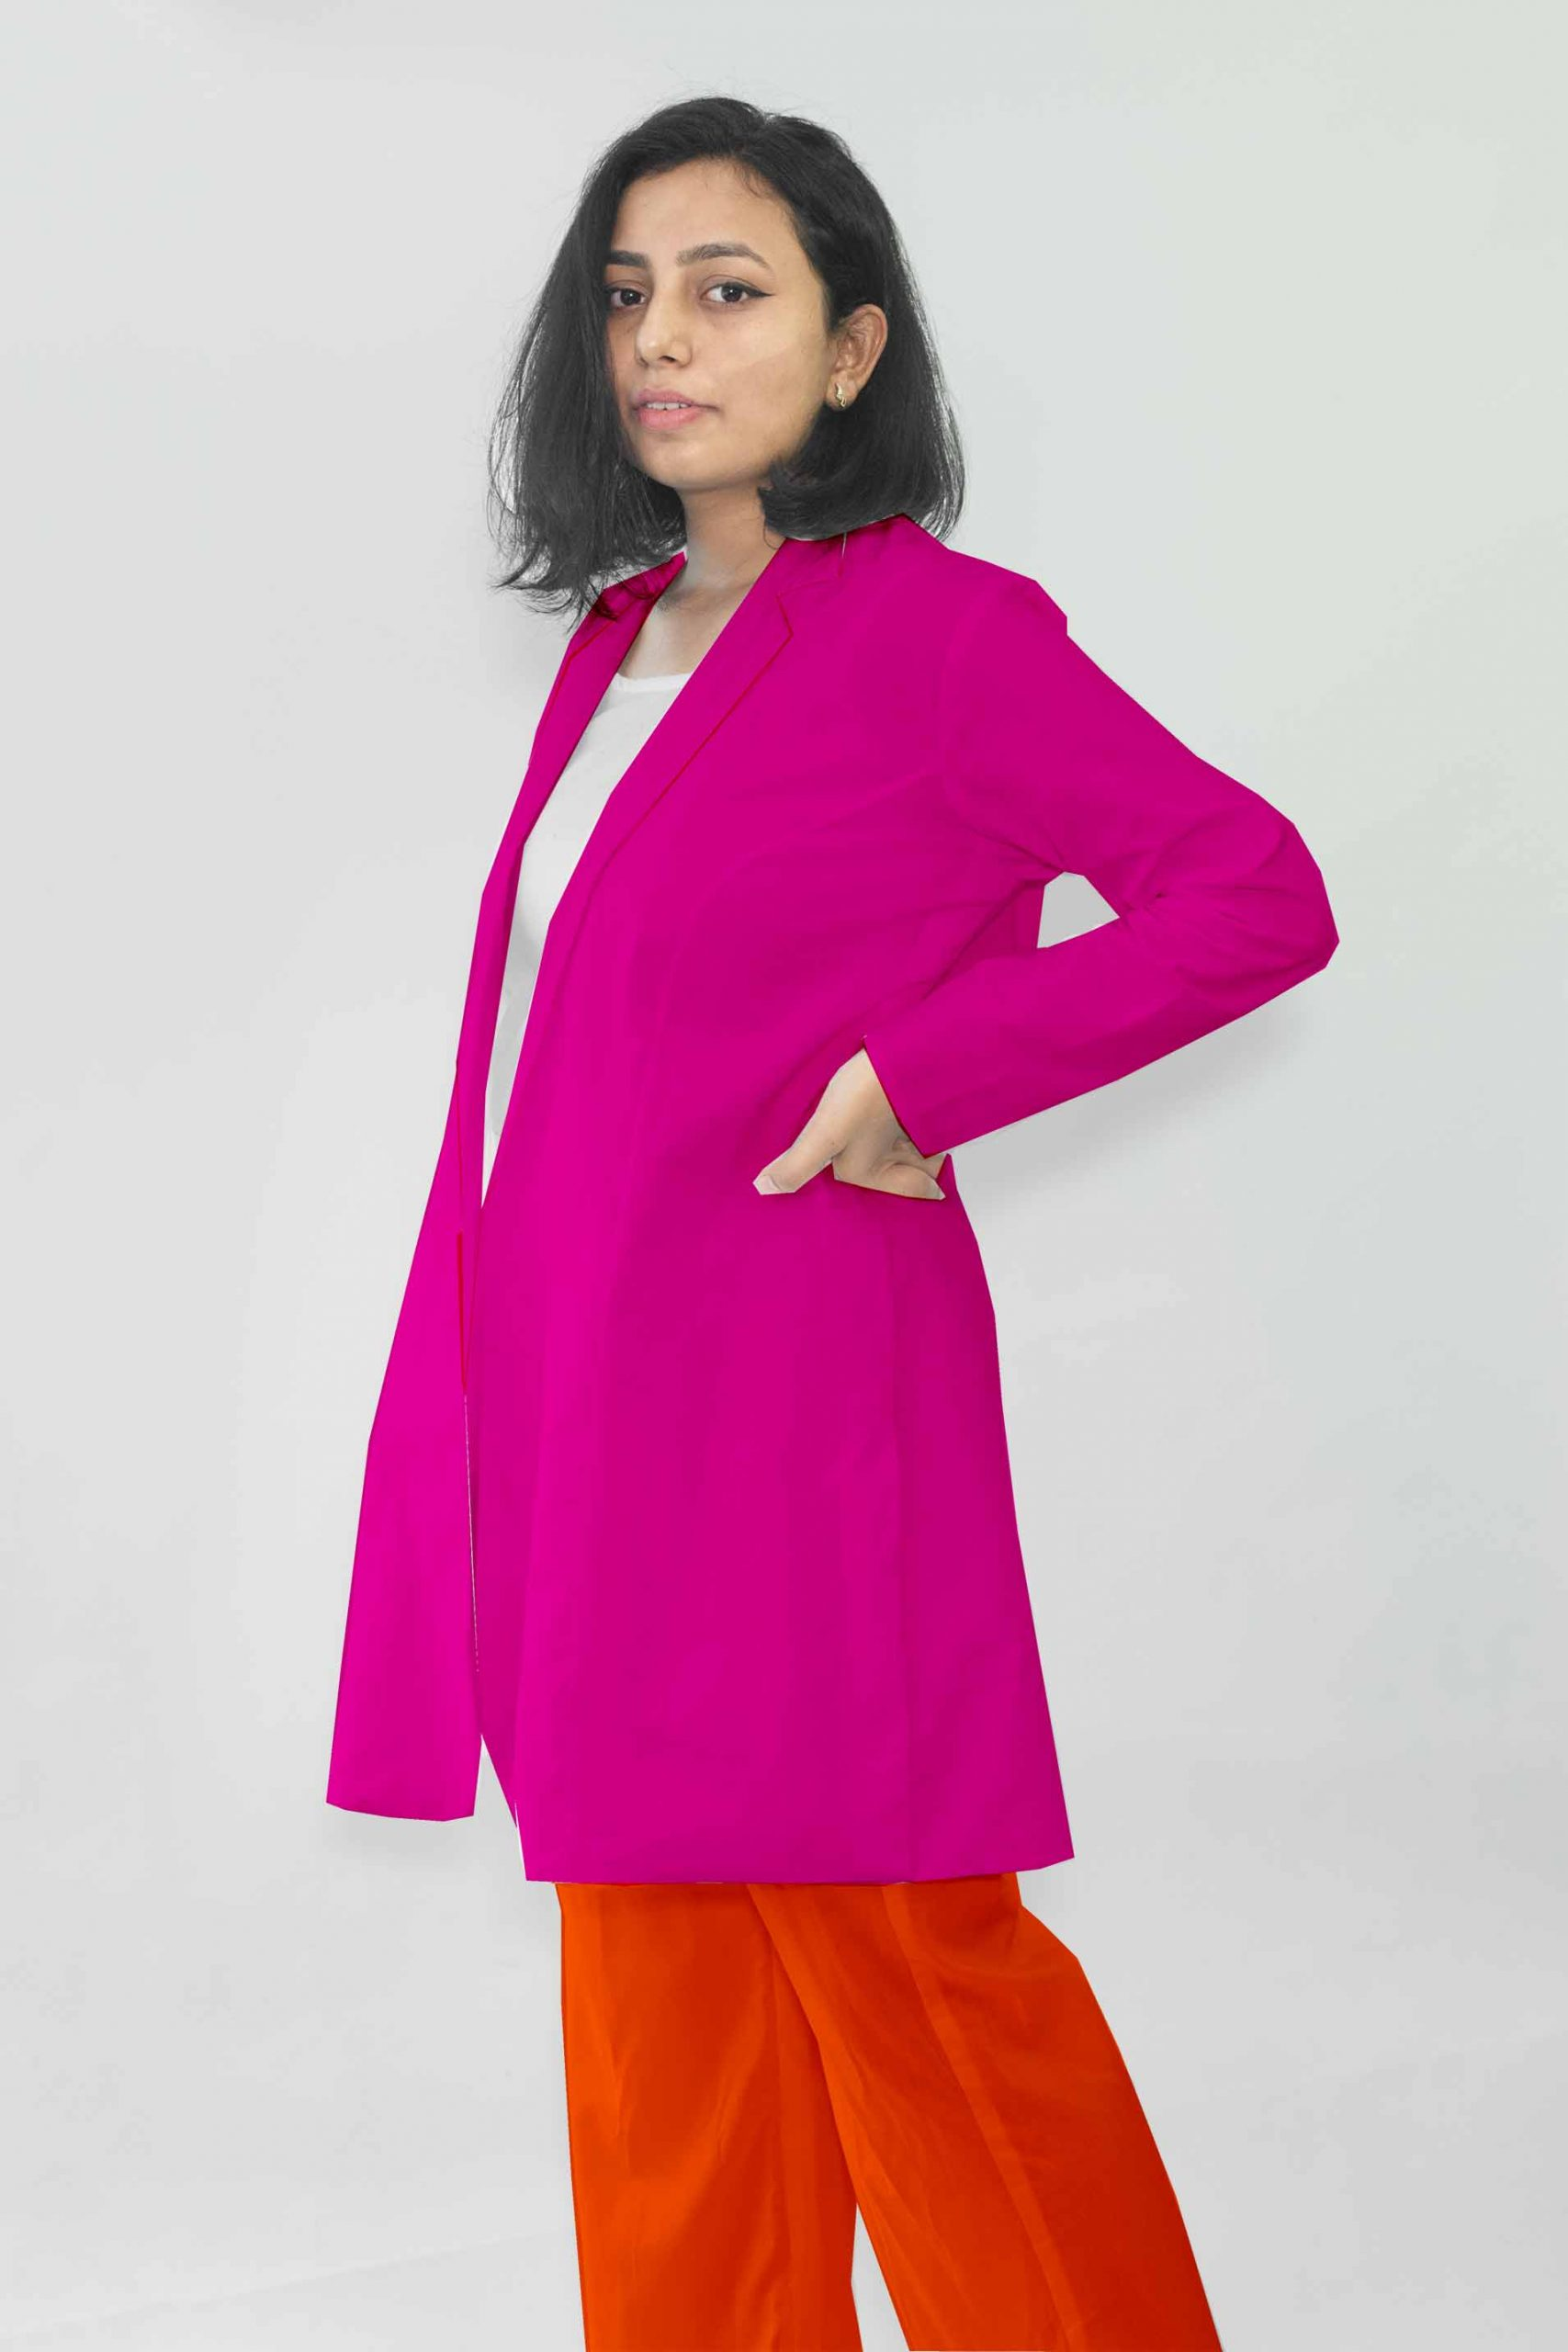 Cotton Blazer Set-Monochrome (Hot Pink)